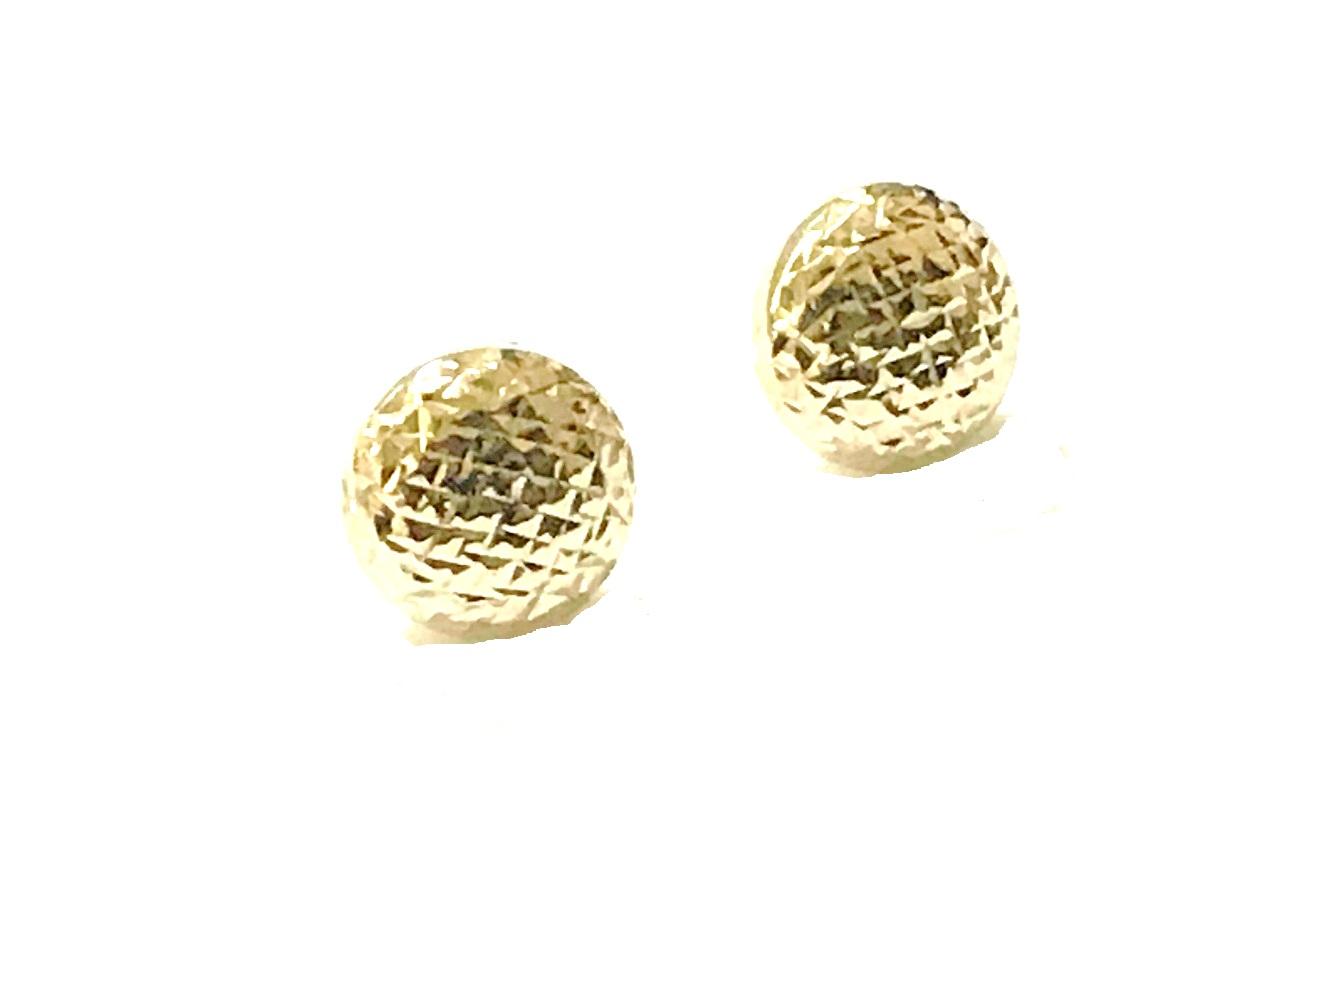 Stud earrings for woman - 10K yellow gold